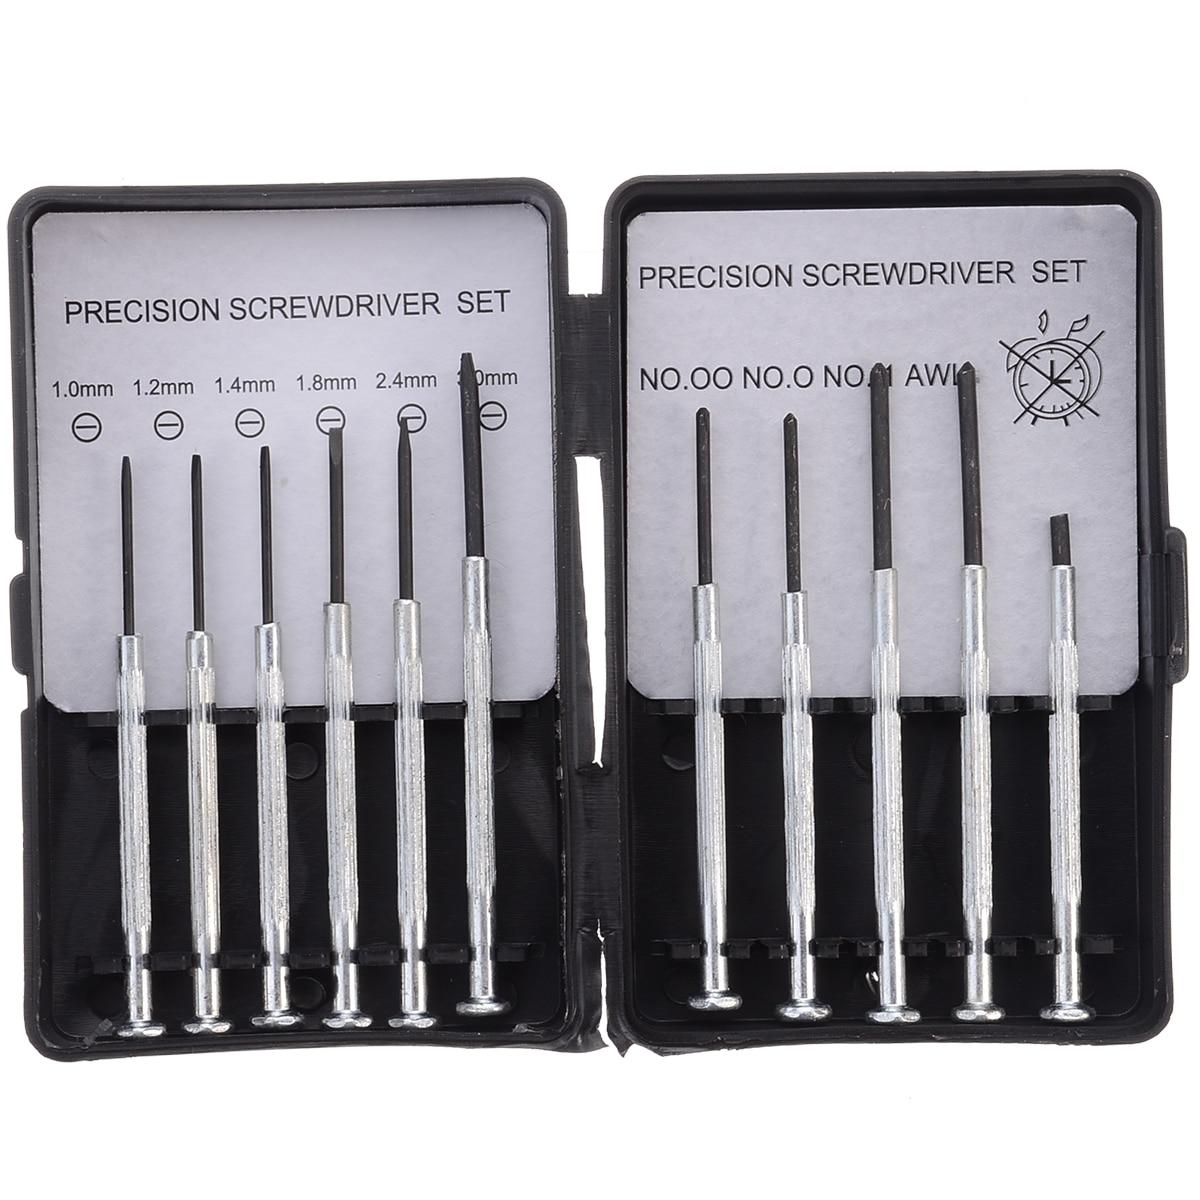 11pcs Precision Screwdriver Set Mini Jewelry Glasses Watch Clock Screwdrivers Repair Hand Tool Kit